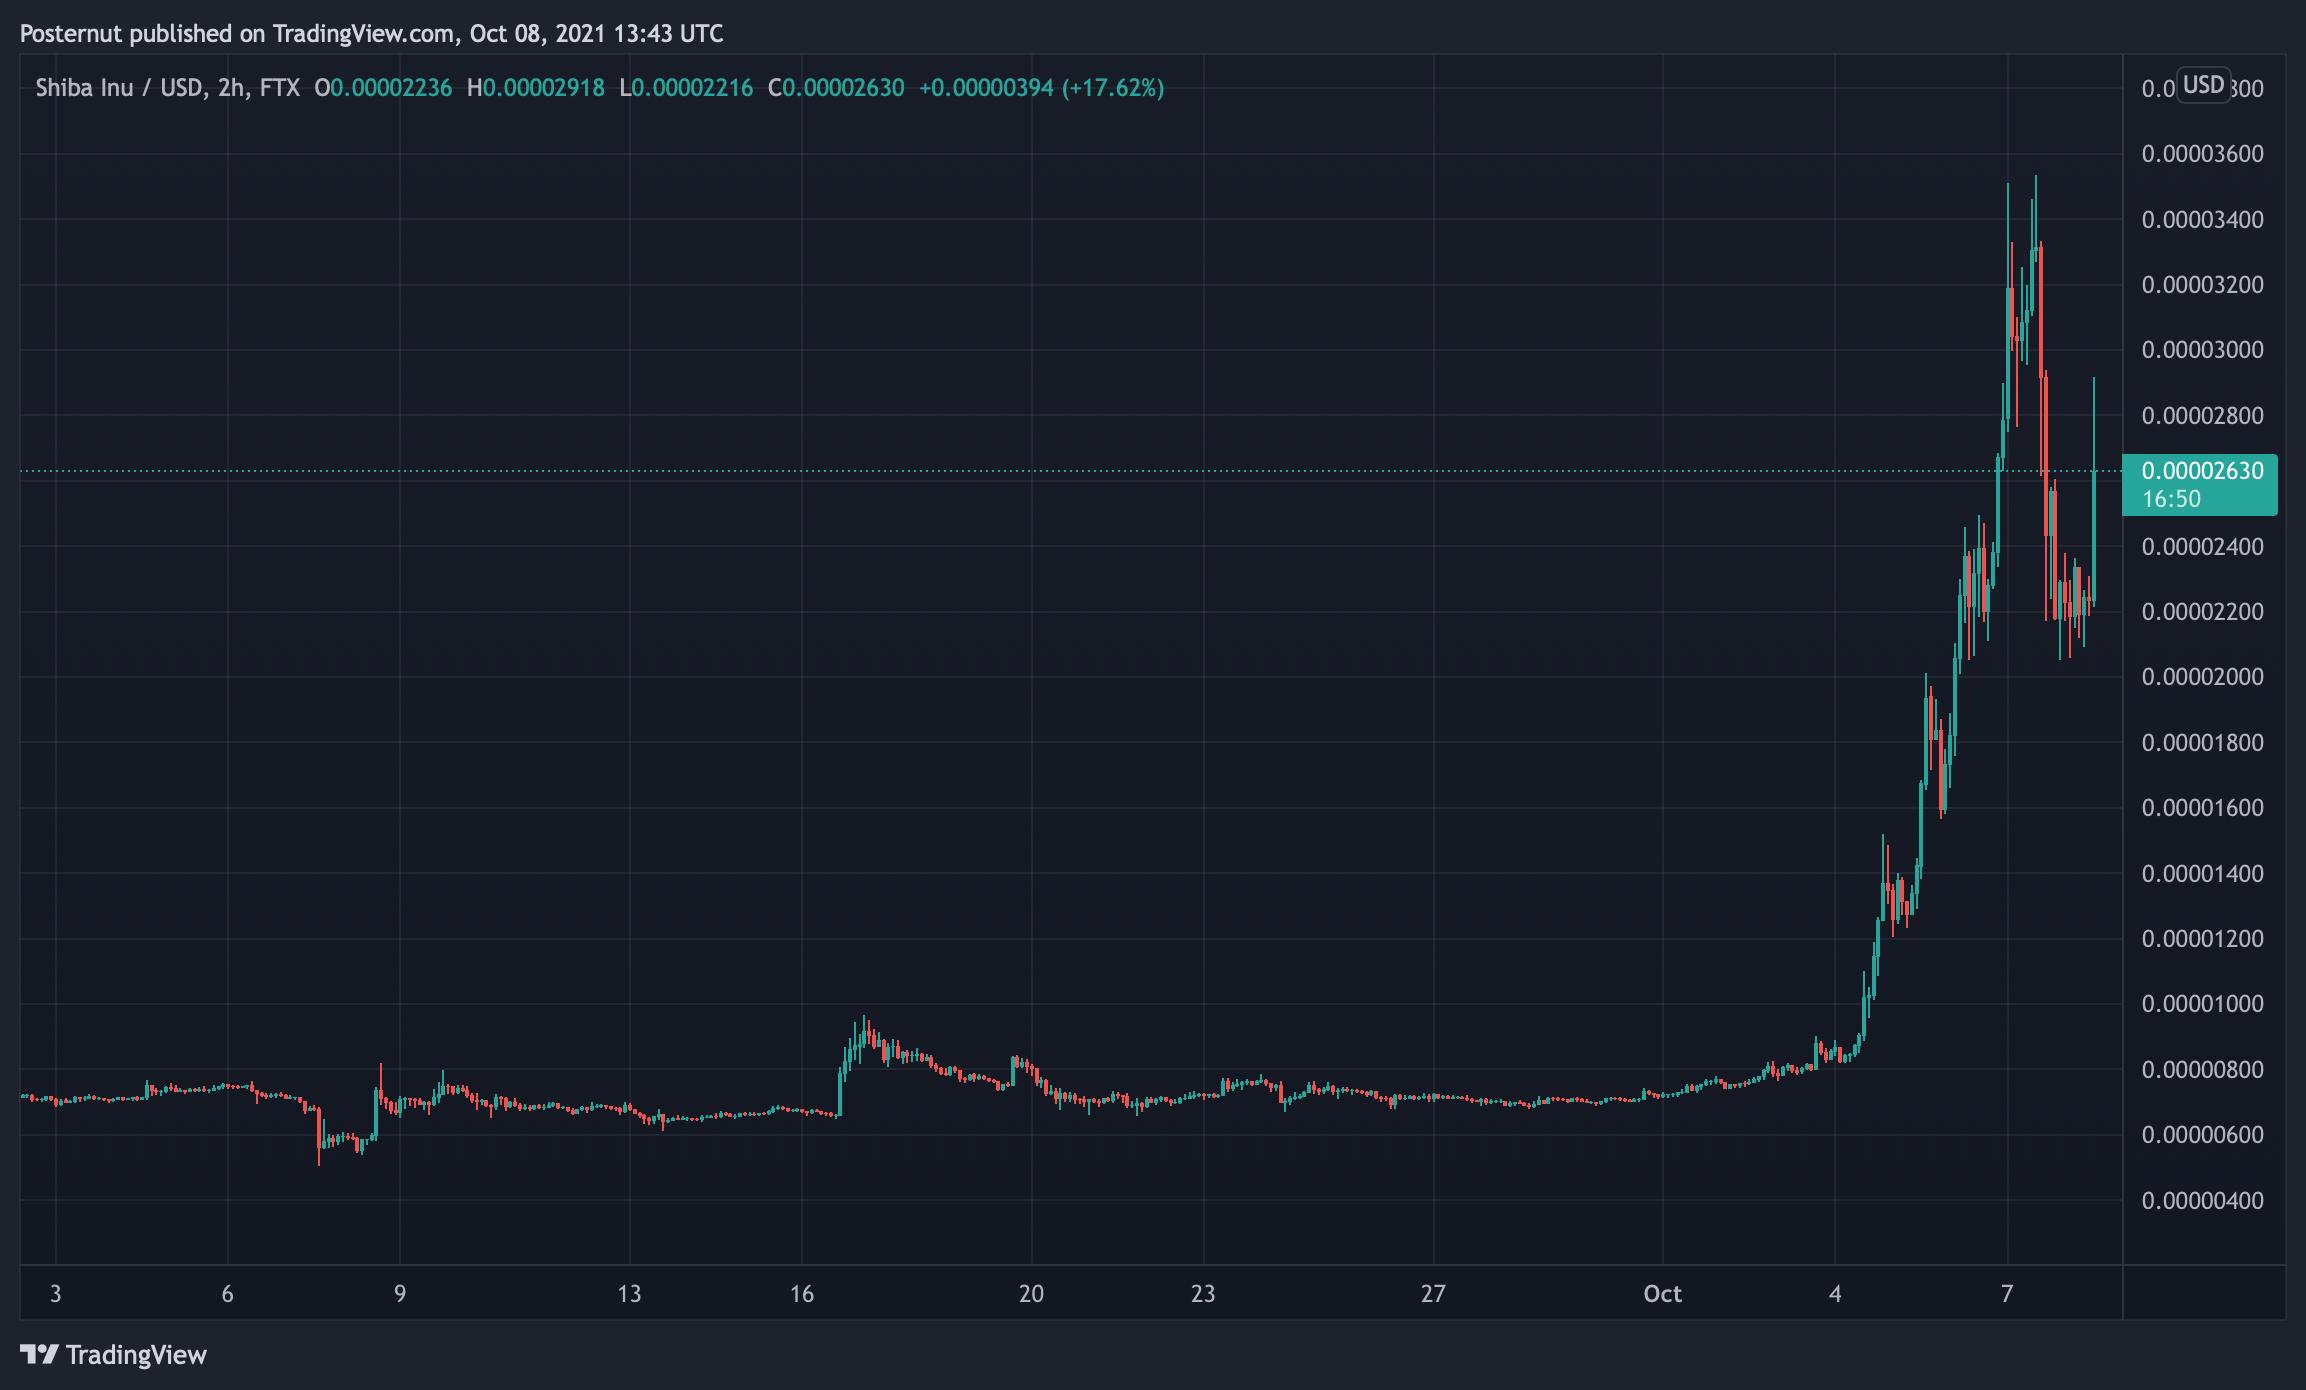 Meme Crypto Shiba Inu Skyrockets — SHIB Climbs 230% in a Week, Whale Buys 6 Trillion Tokens